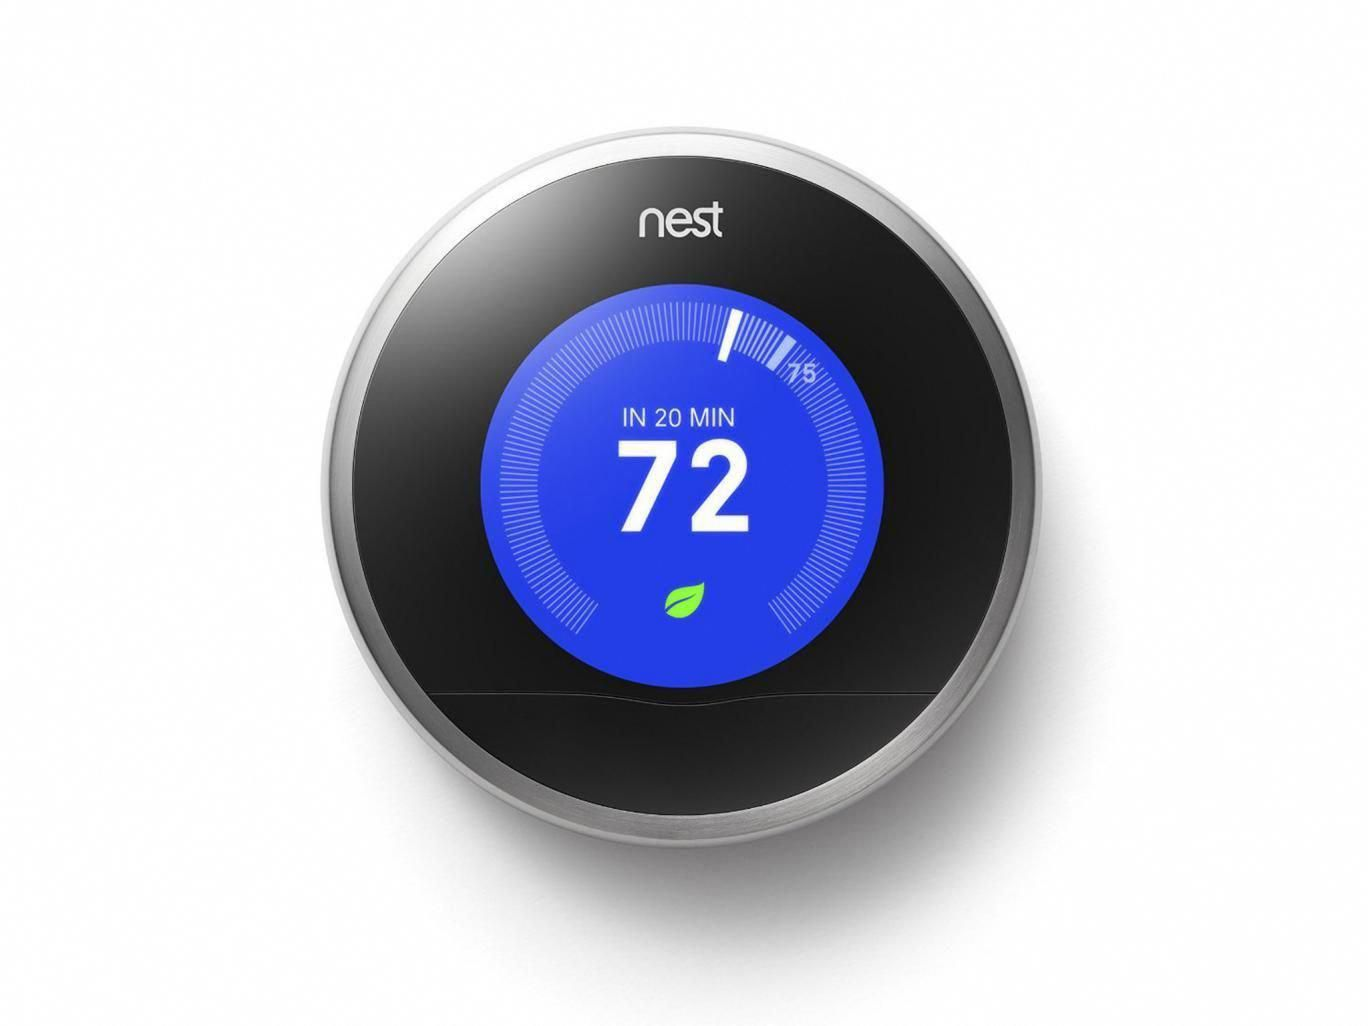 10 Best Smart Home Technology Smarthomelighting Temerario With Images Smart Home Technology Best Smart Home Home Technology